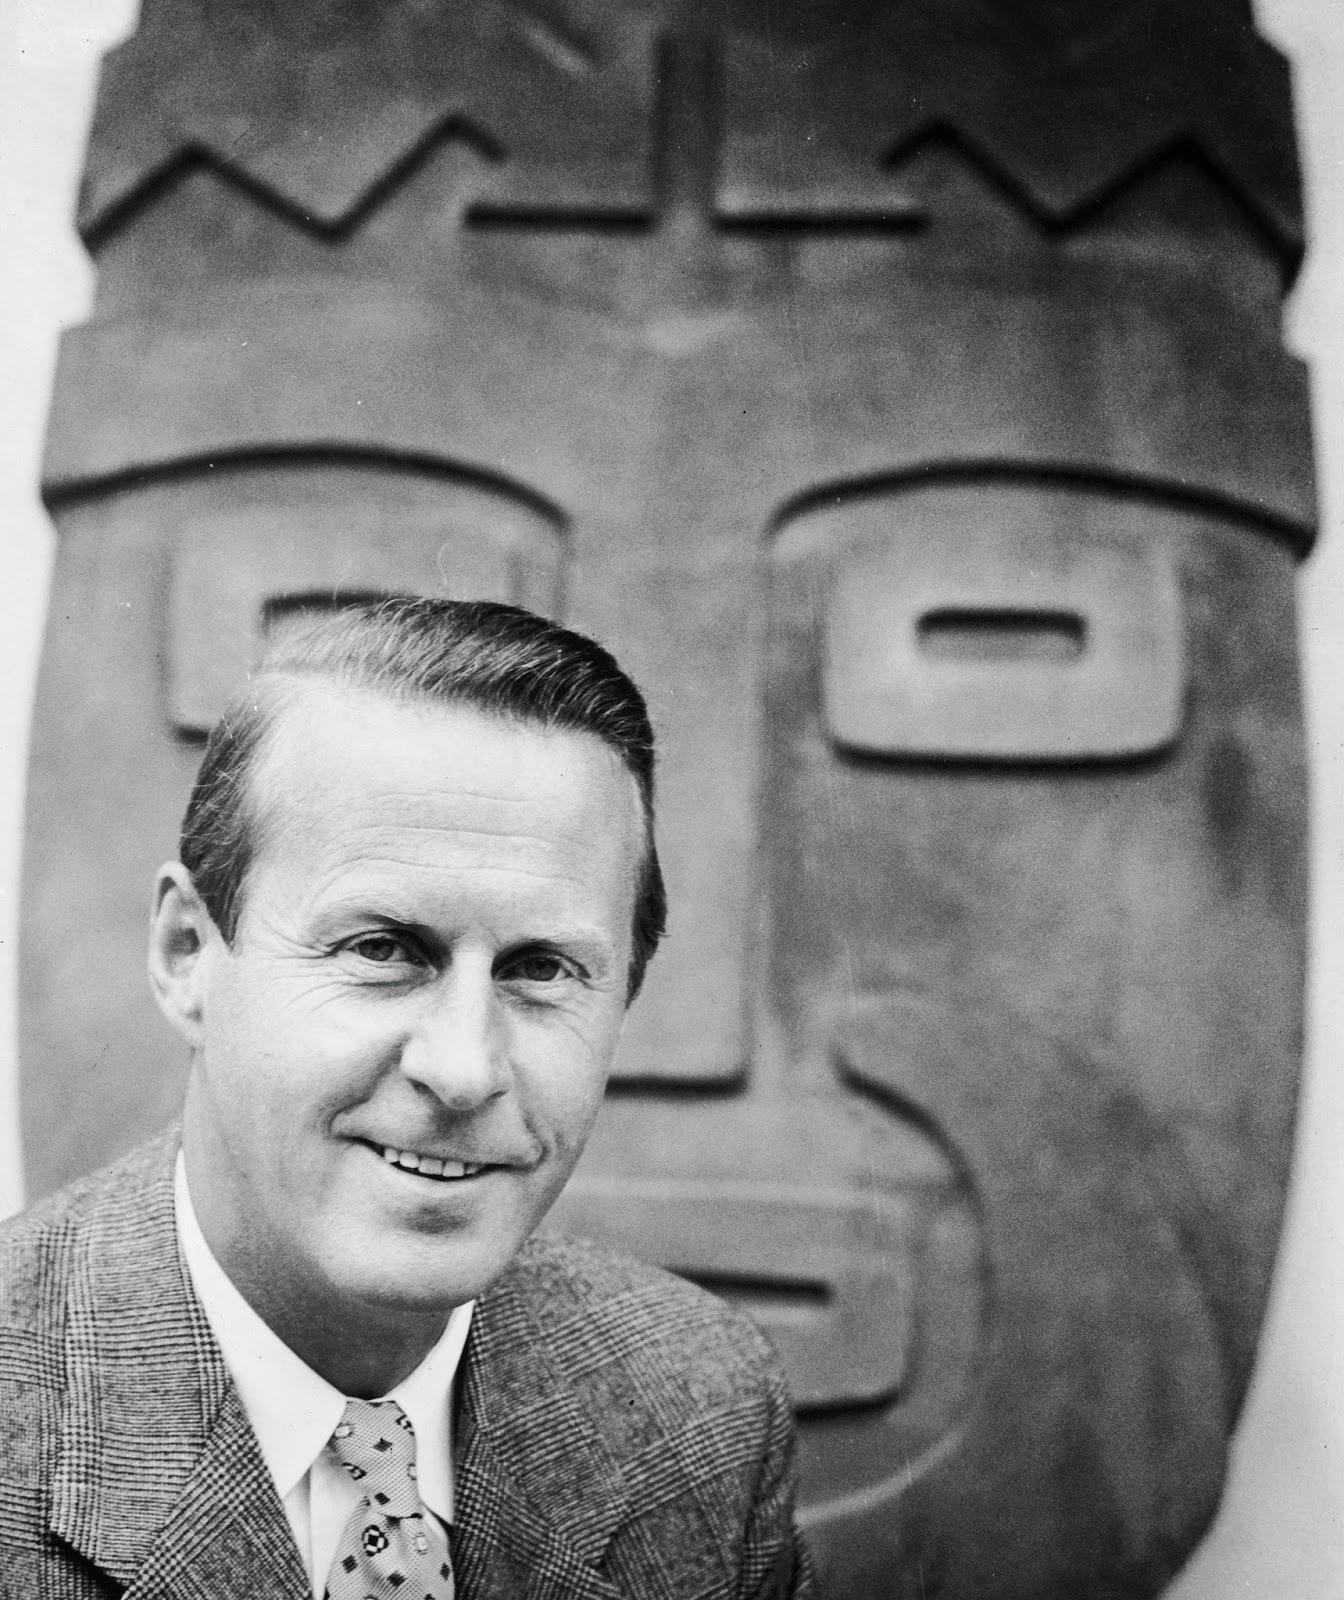 Biografi Thor Heyerdahl